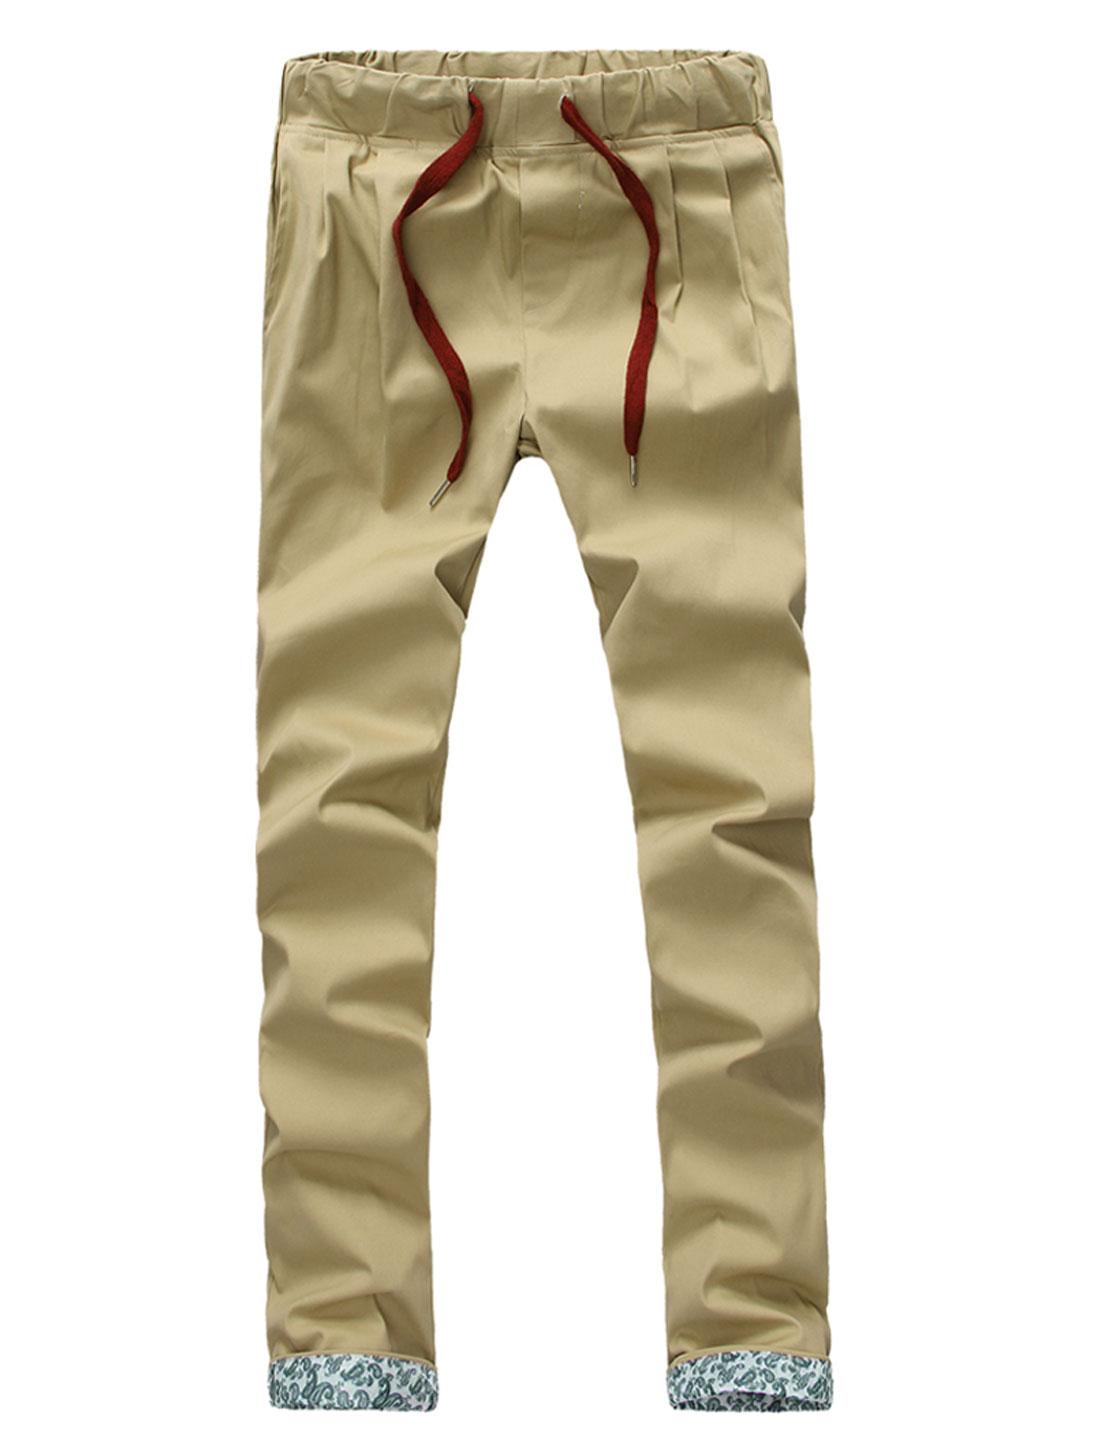 Men Mid Waist Drawstring Front Pockets Leisure Pants Khaki W32